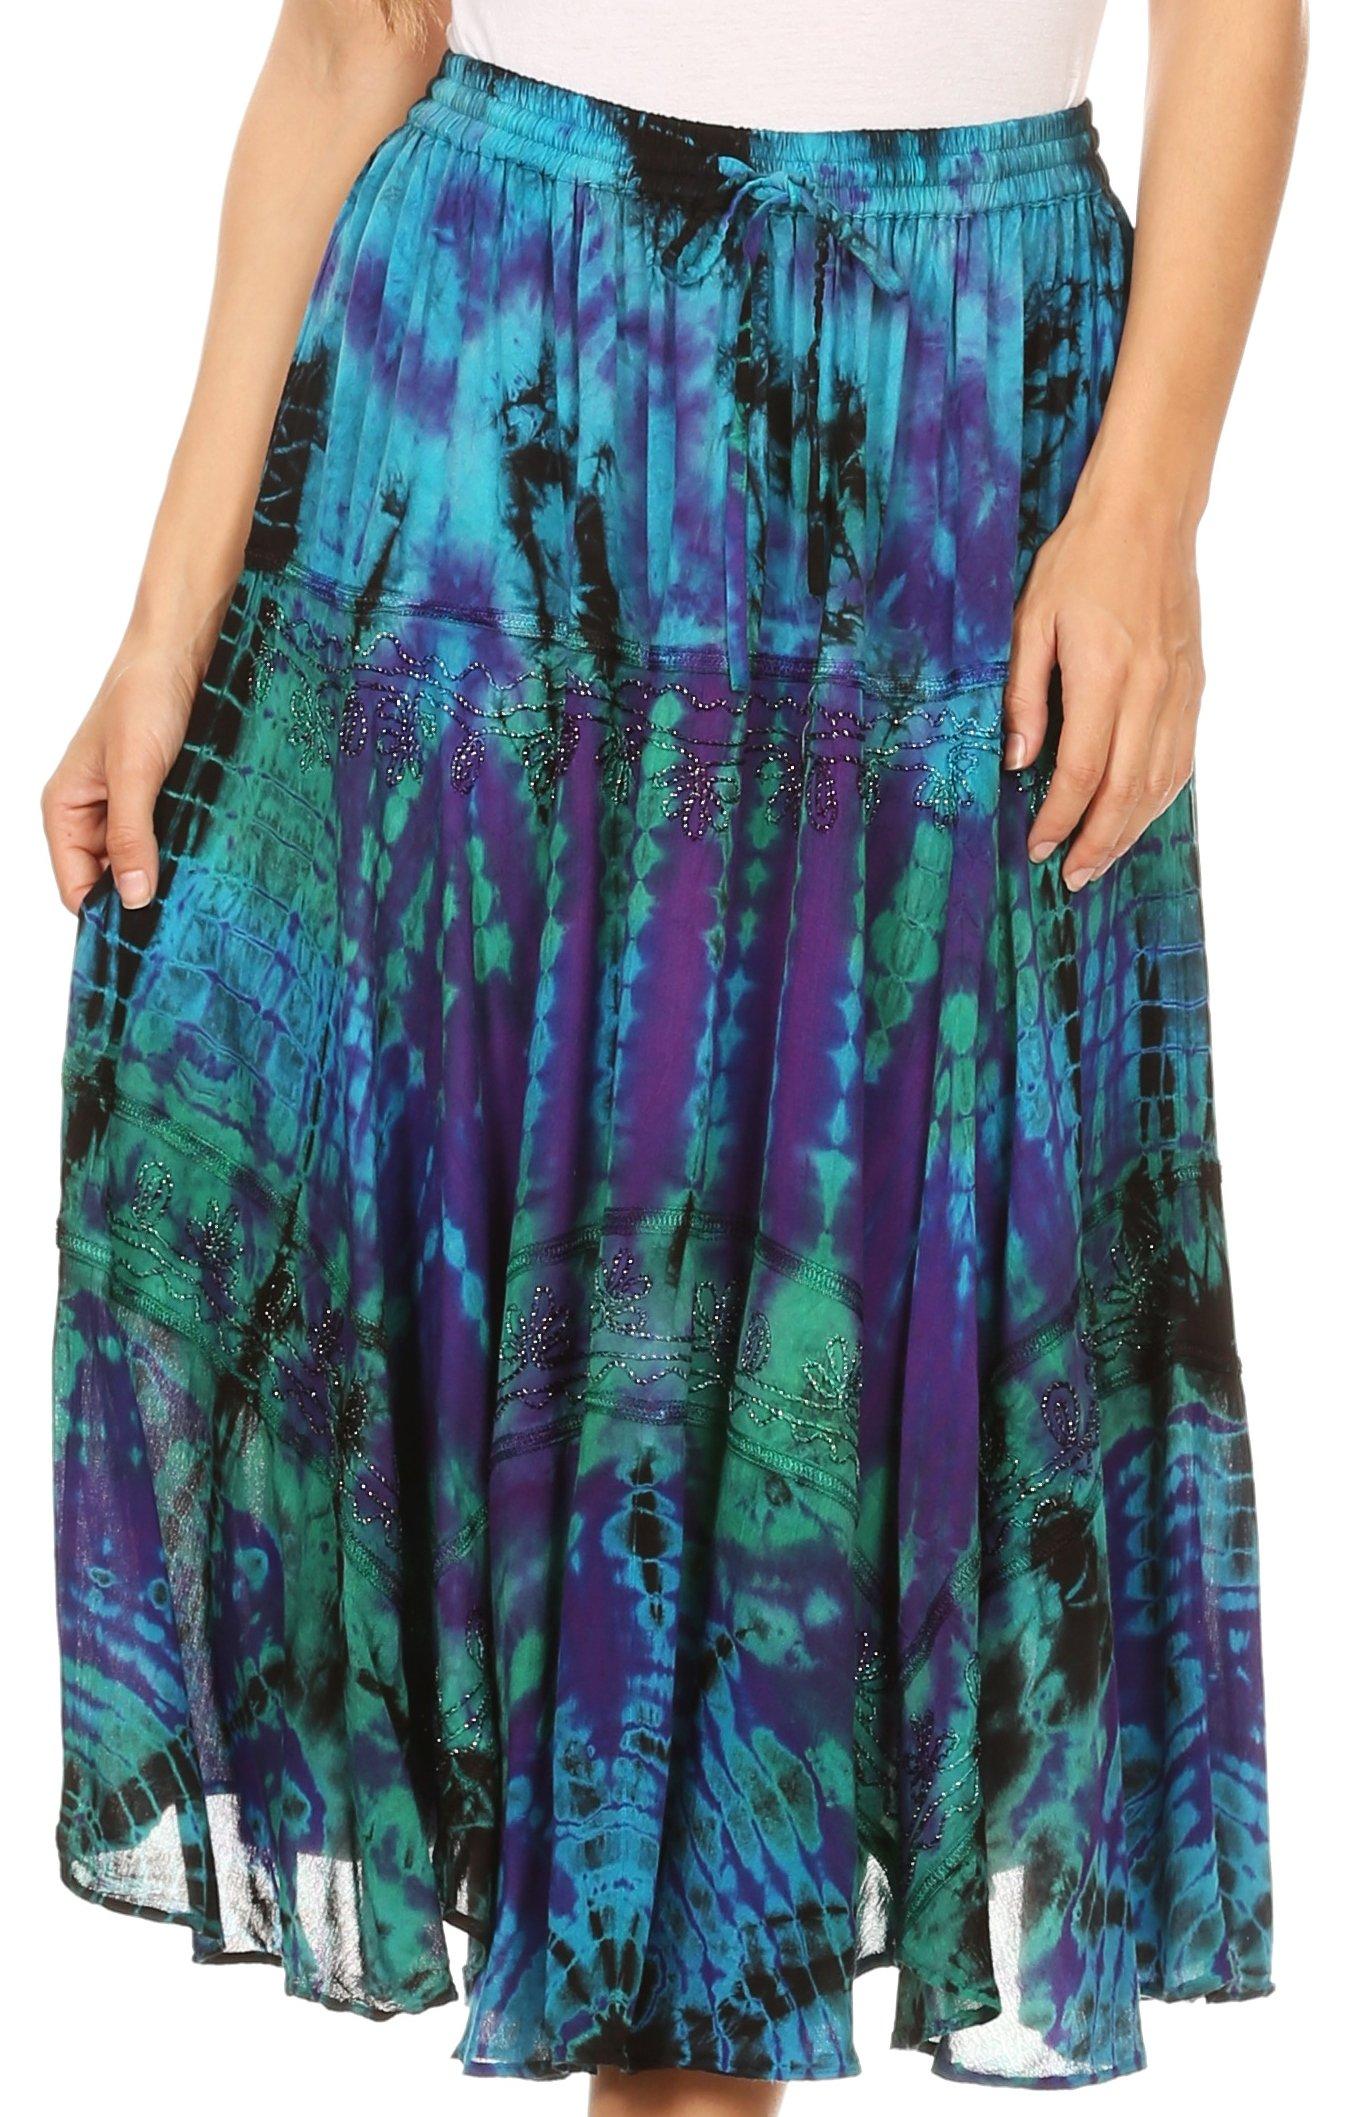 Sakkas 18221 - Justina Womens Dance Midi Full Circle Tie-Dye Skirt With Elastic Waist - Purple/Turq - OS